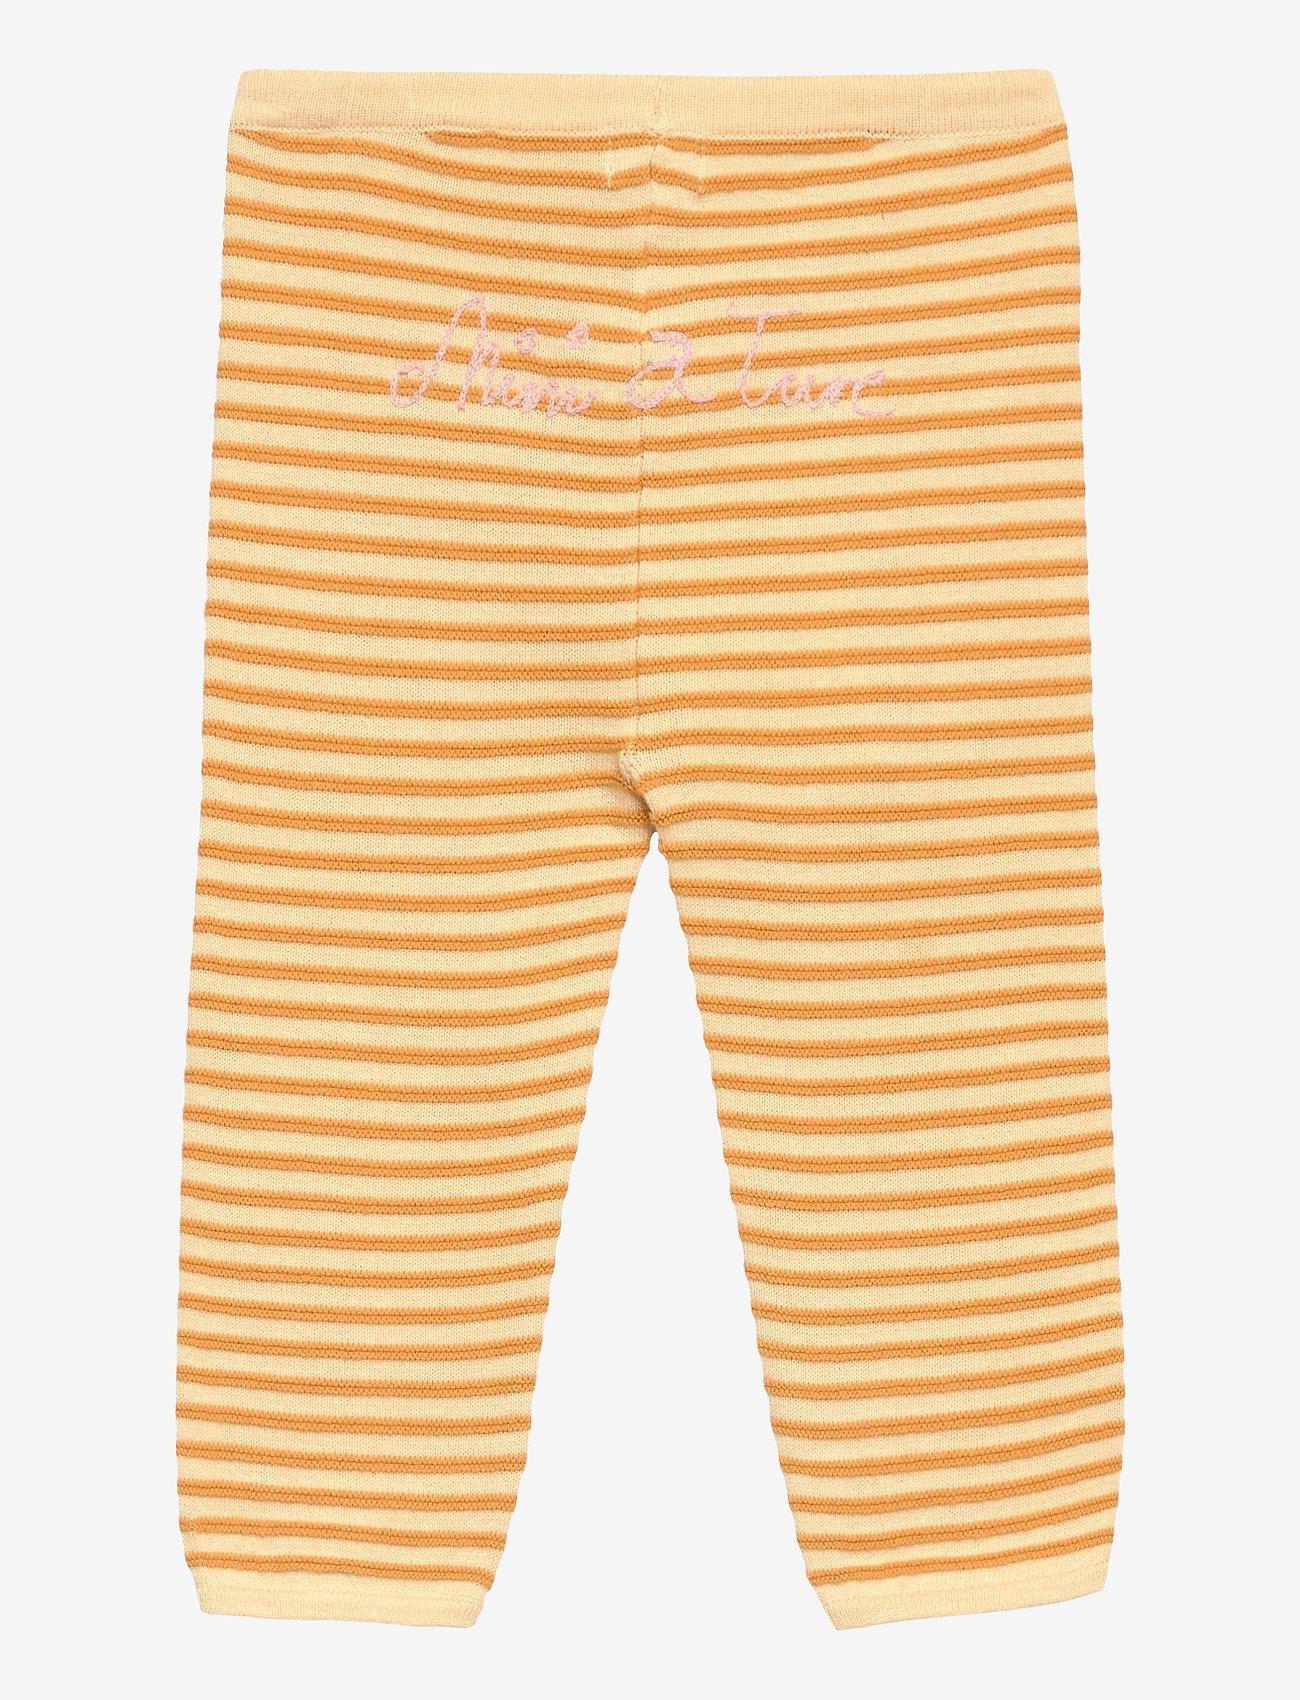 Mini A Ture - Tilda Pants, B - trousers - apricot gelato - 1